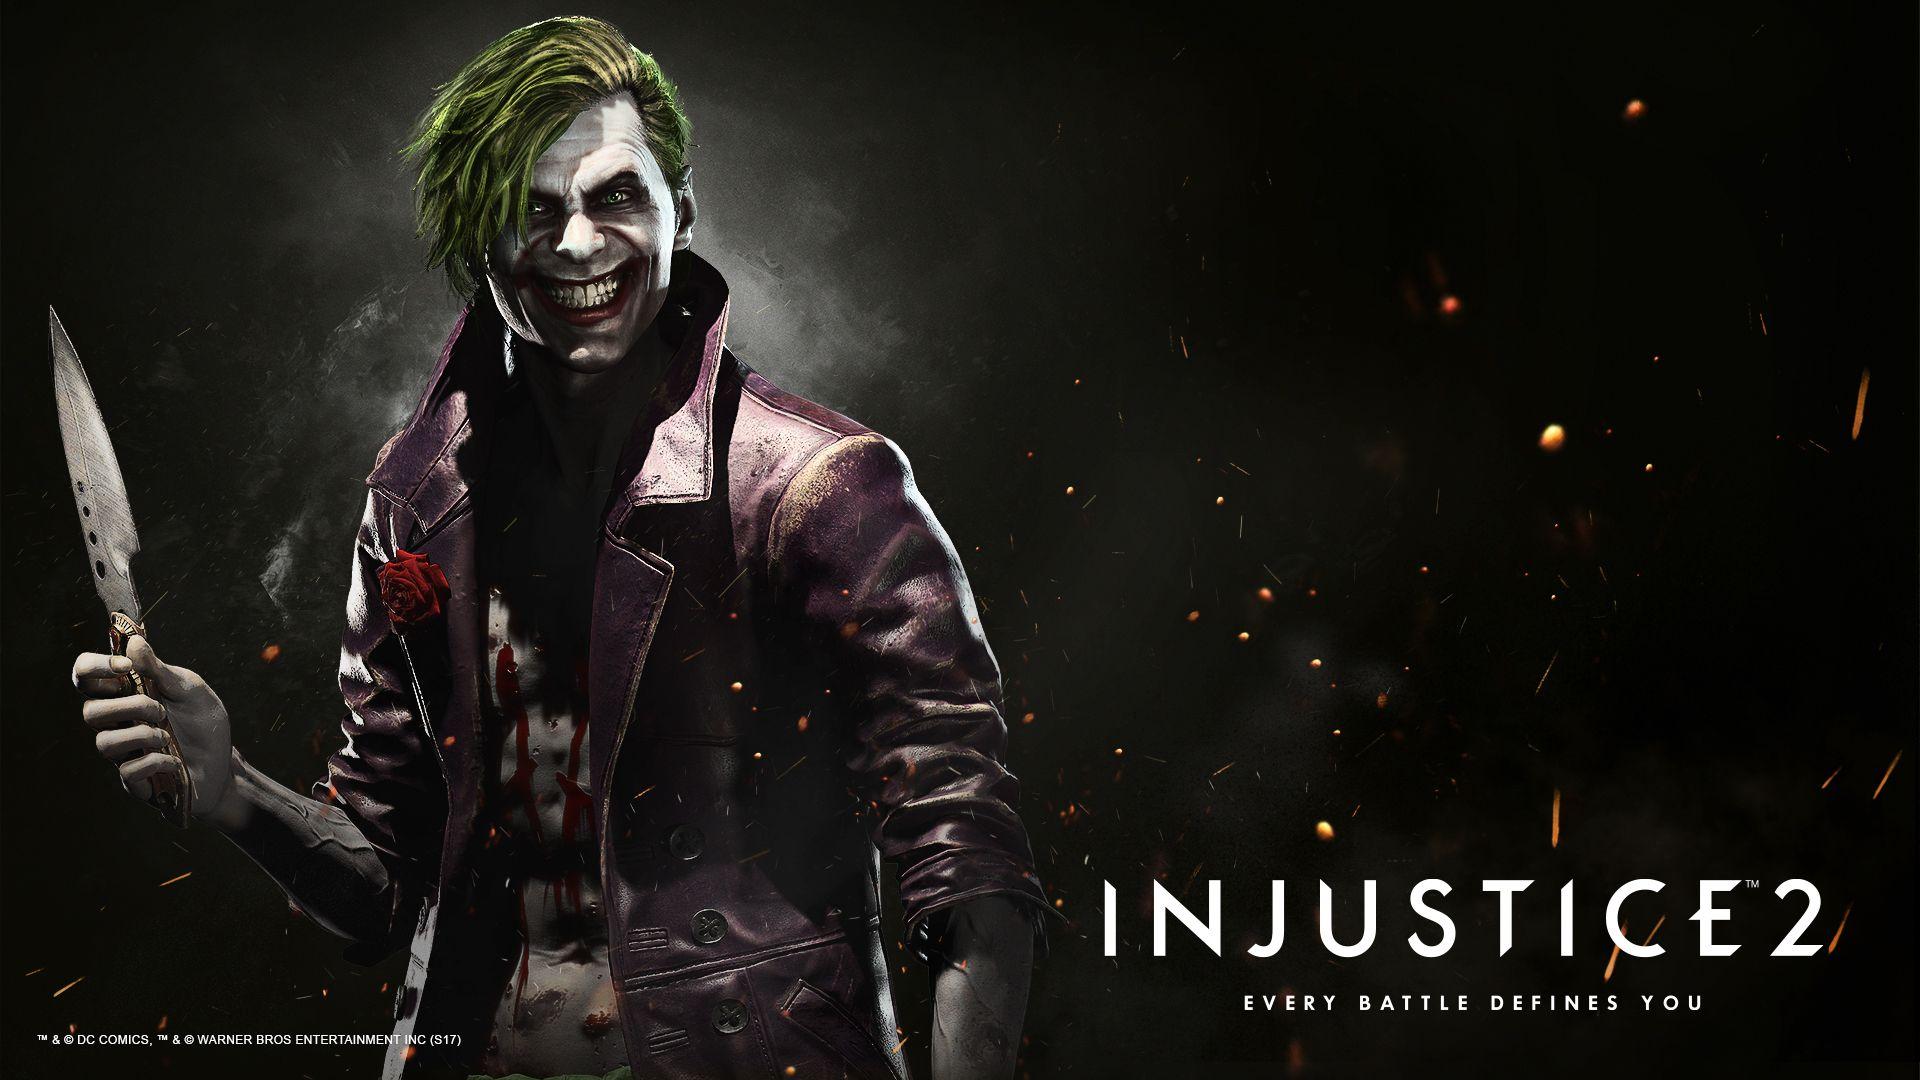 Image injustice2 the joker wallpaper 1920x1080 31g injustice2 the joker wallpaper 1920x1080 31g voltagebd Images